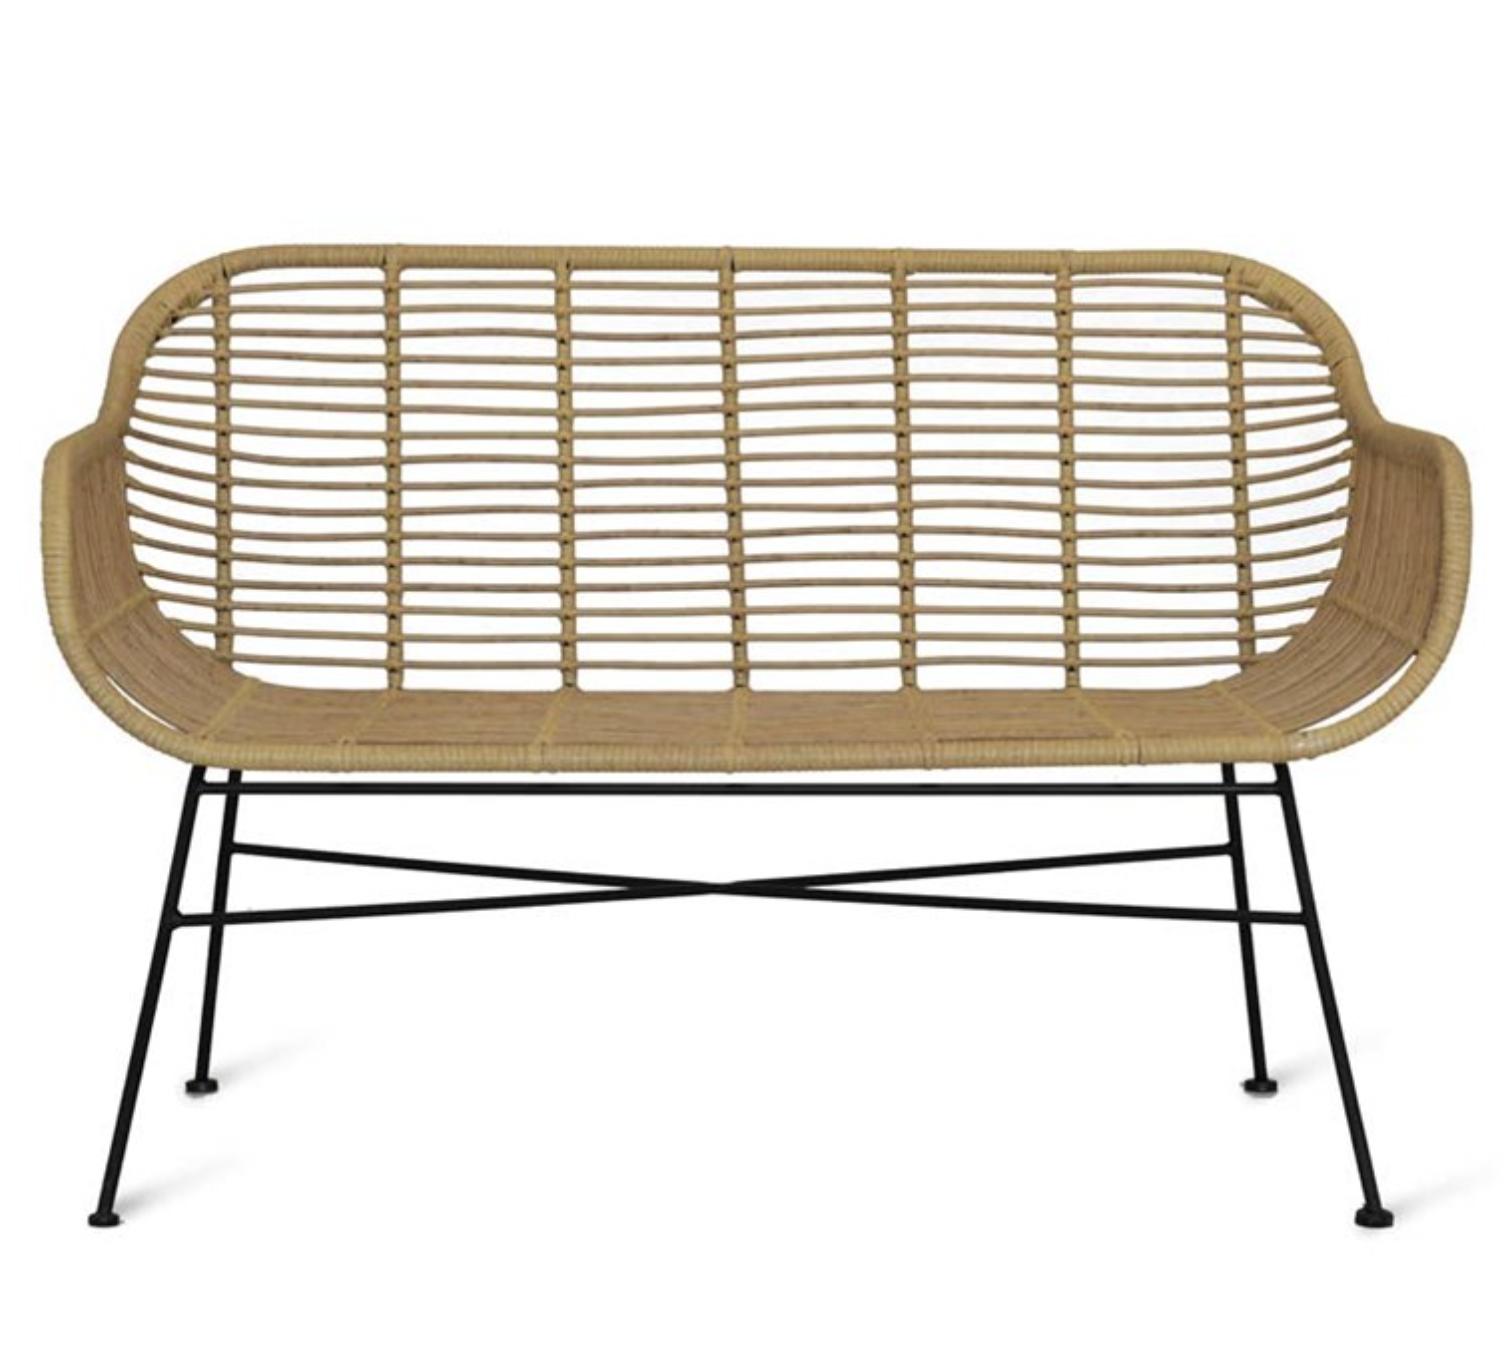 Garden Trading -  Hampstead bench £285